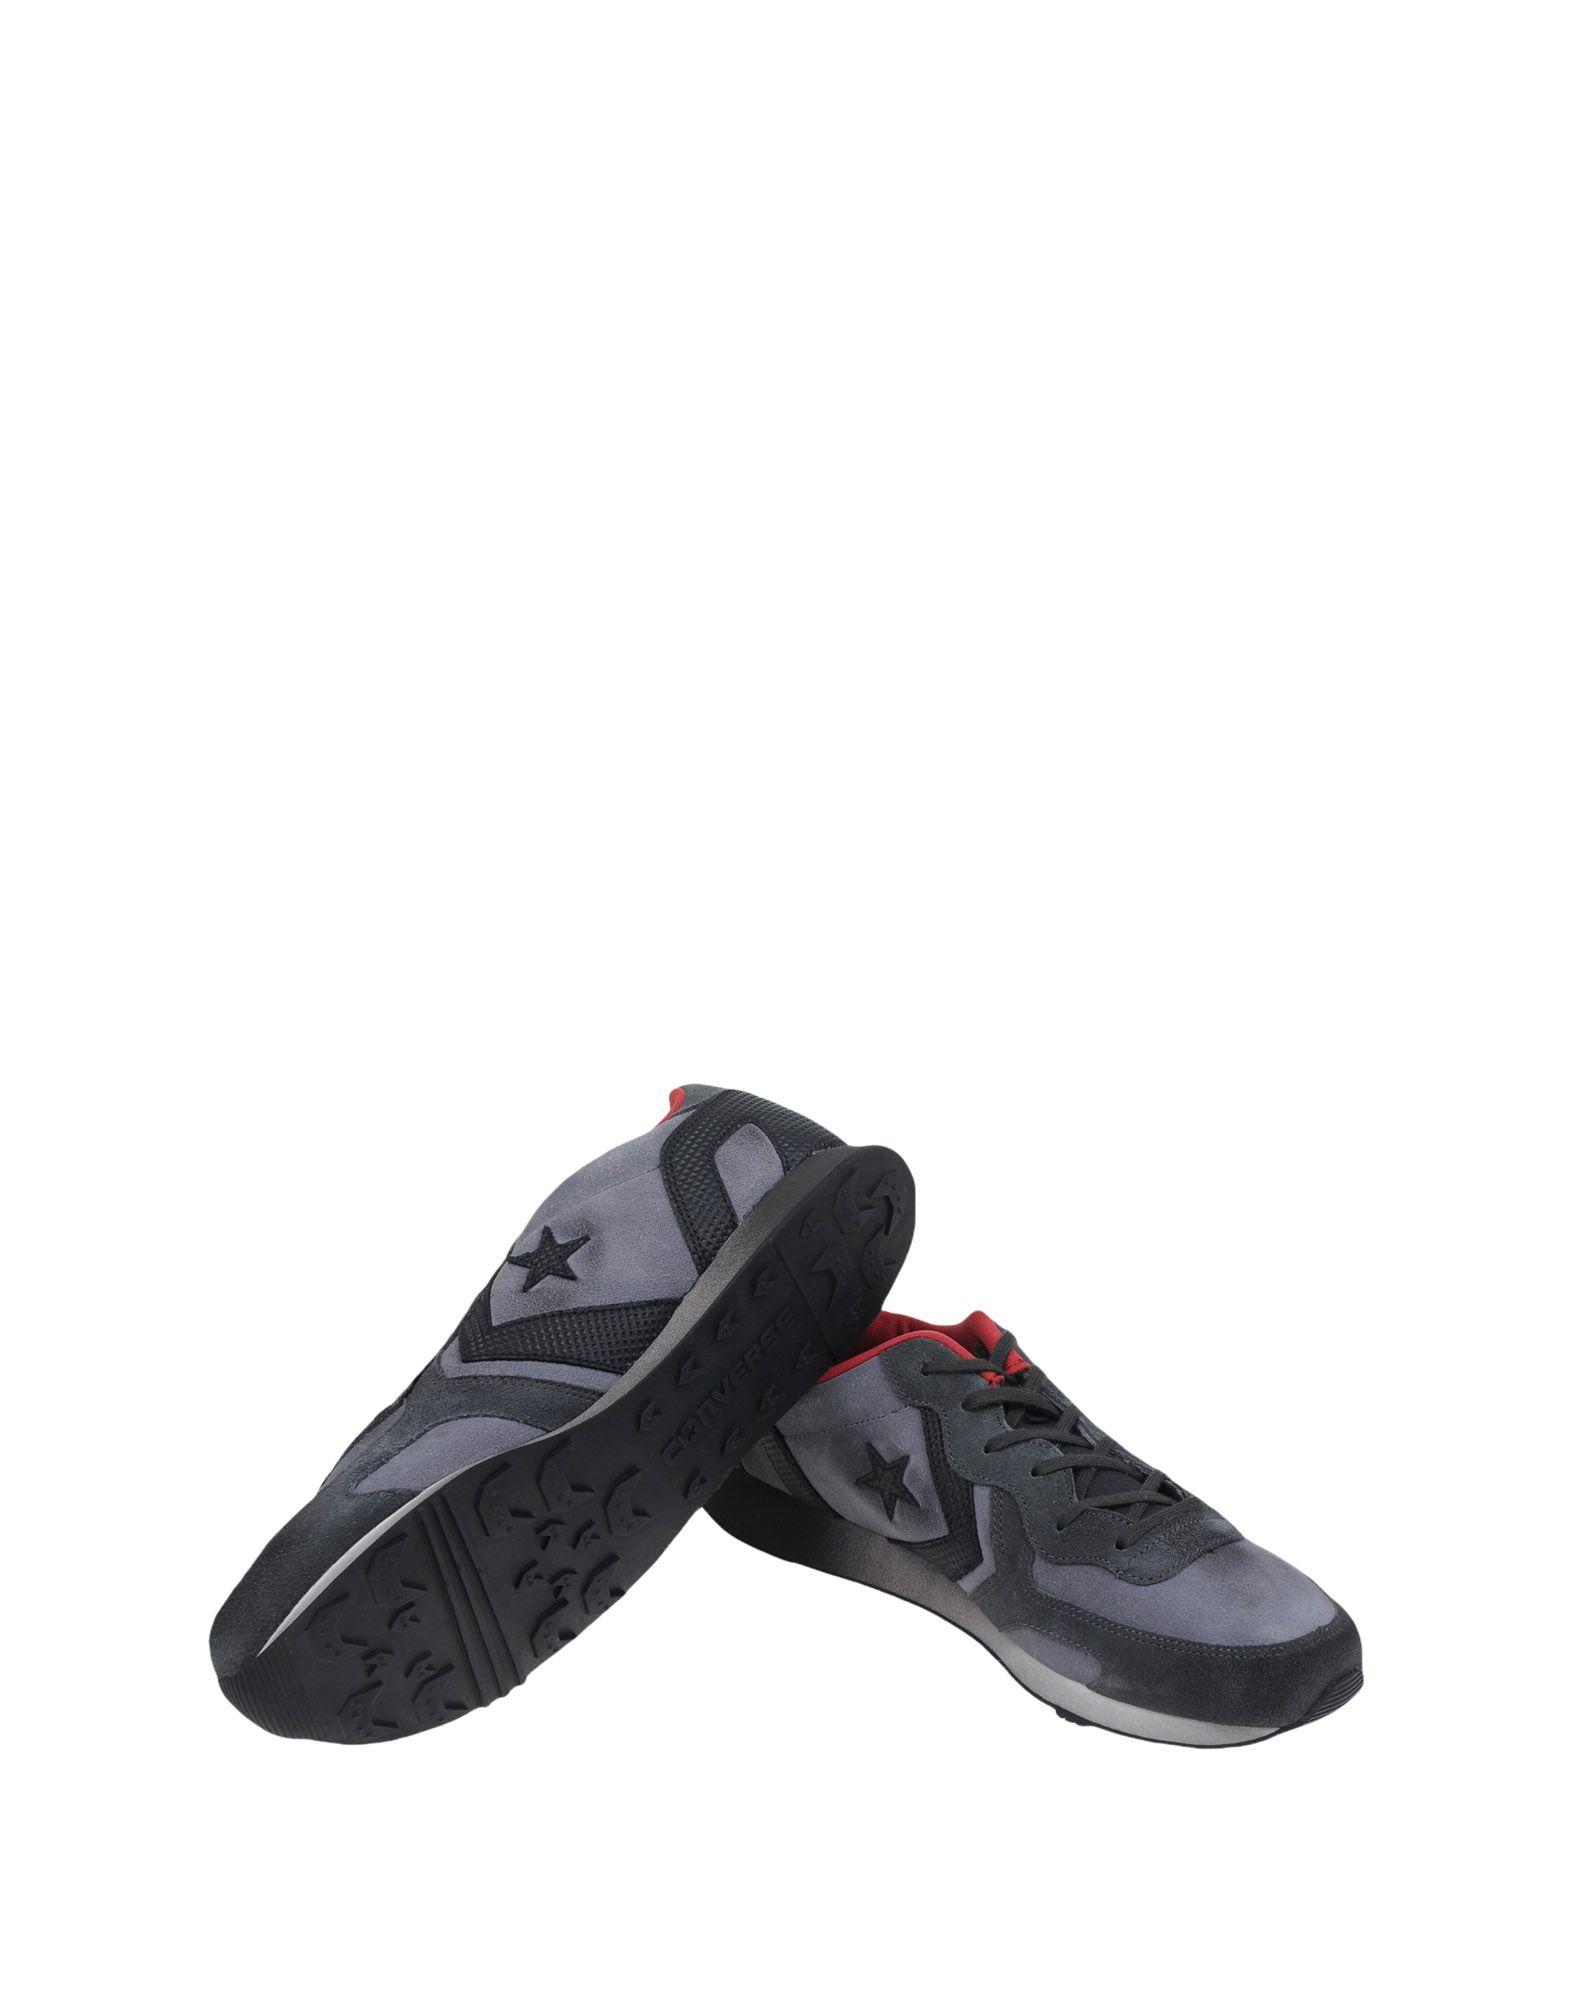 Rabatt echte Schuhe Suede Converse Cons Auckland Racer Ox Suede Schuhe  11114107XD 2a5eeb